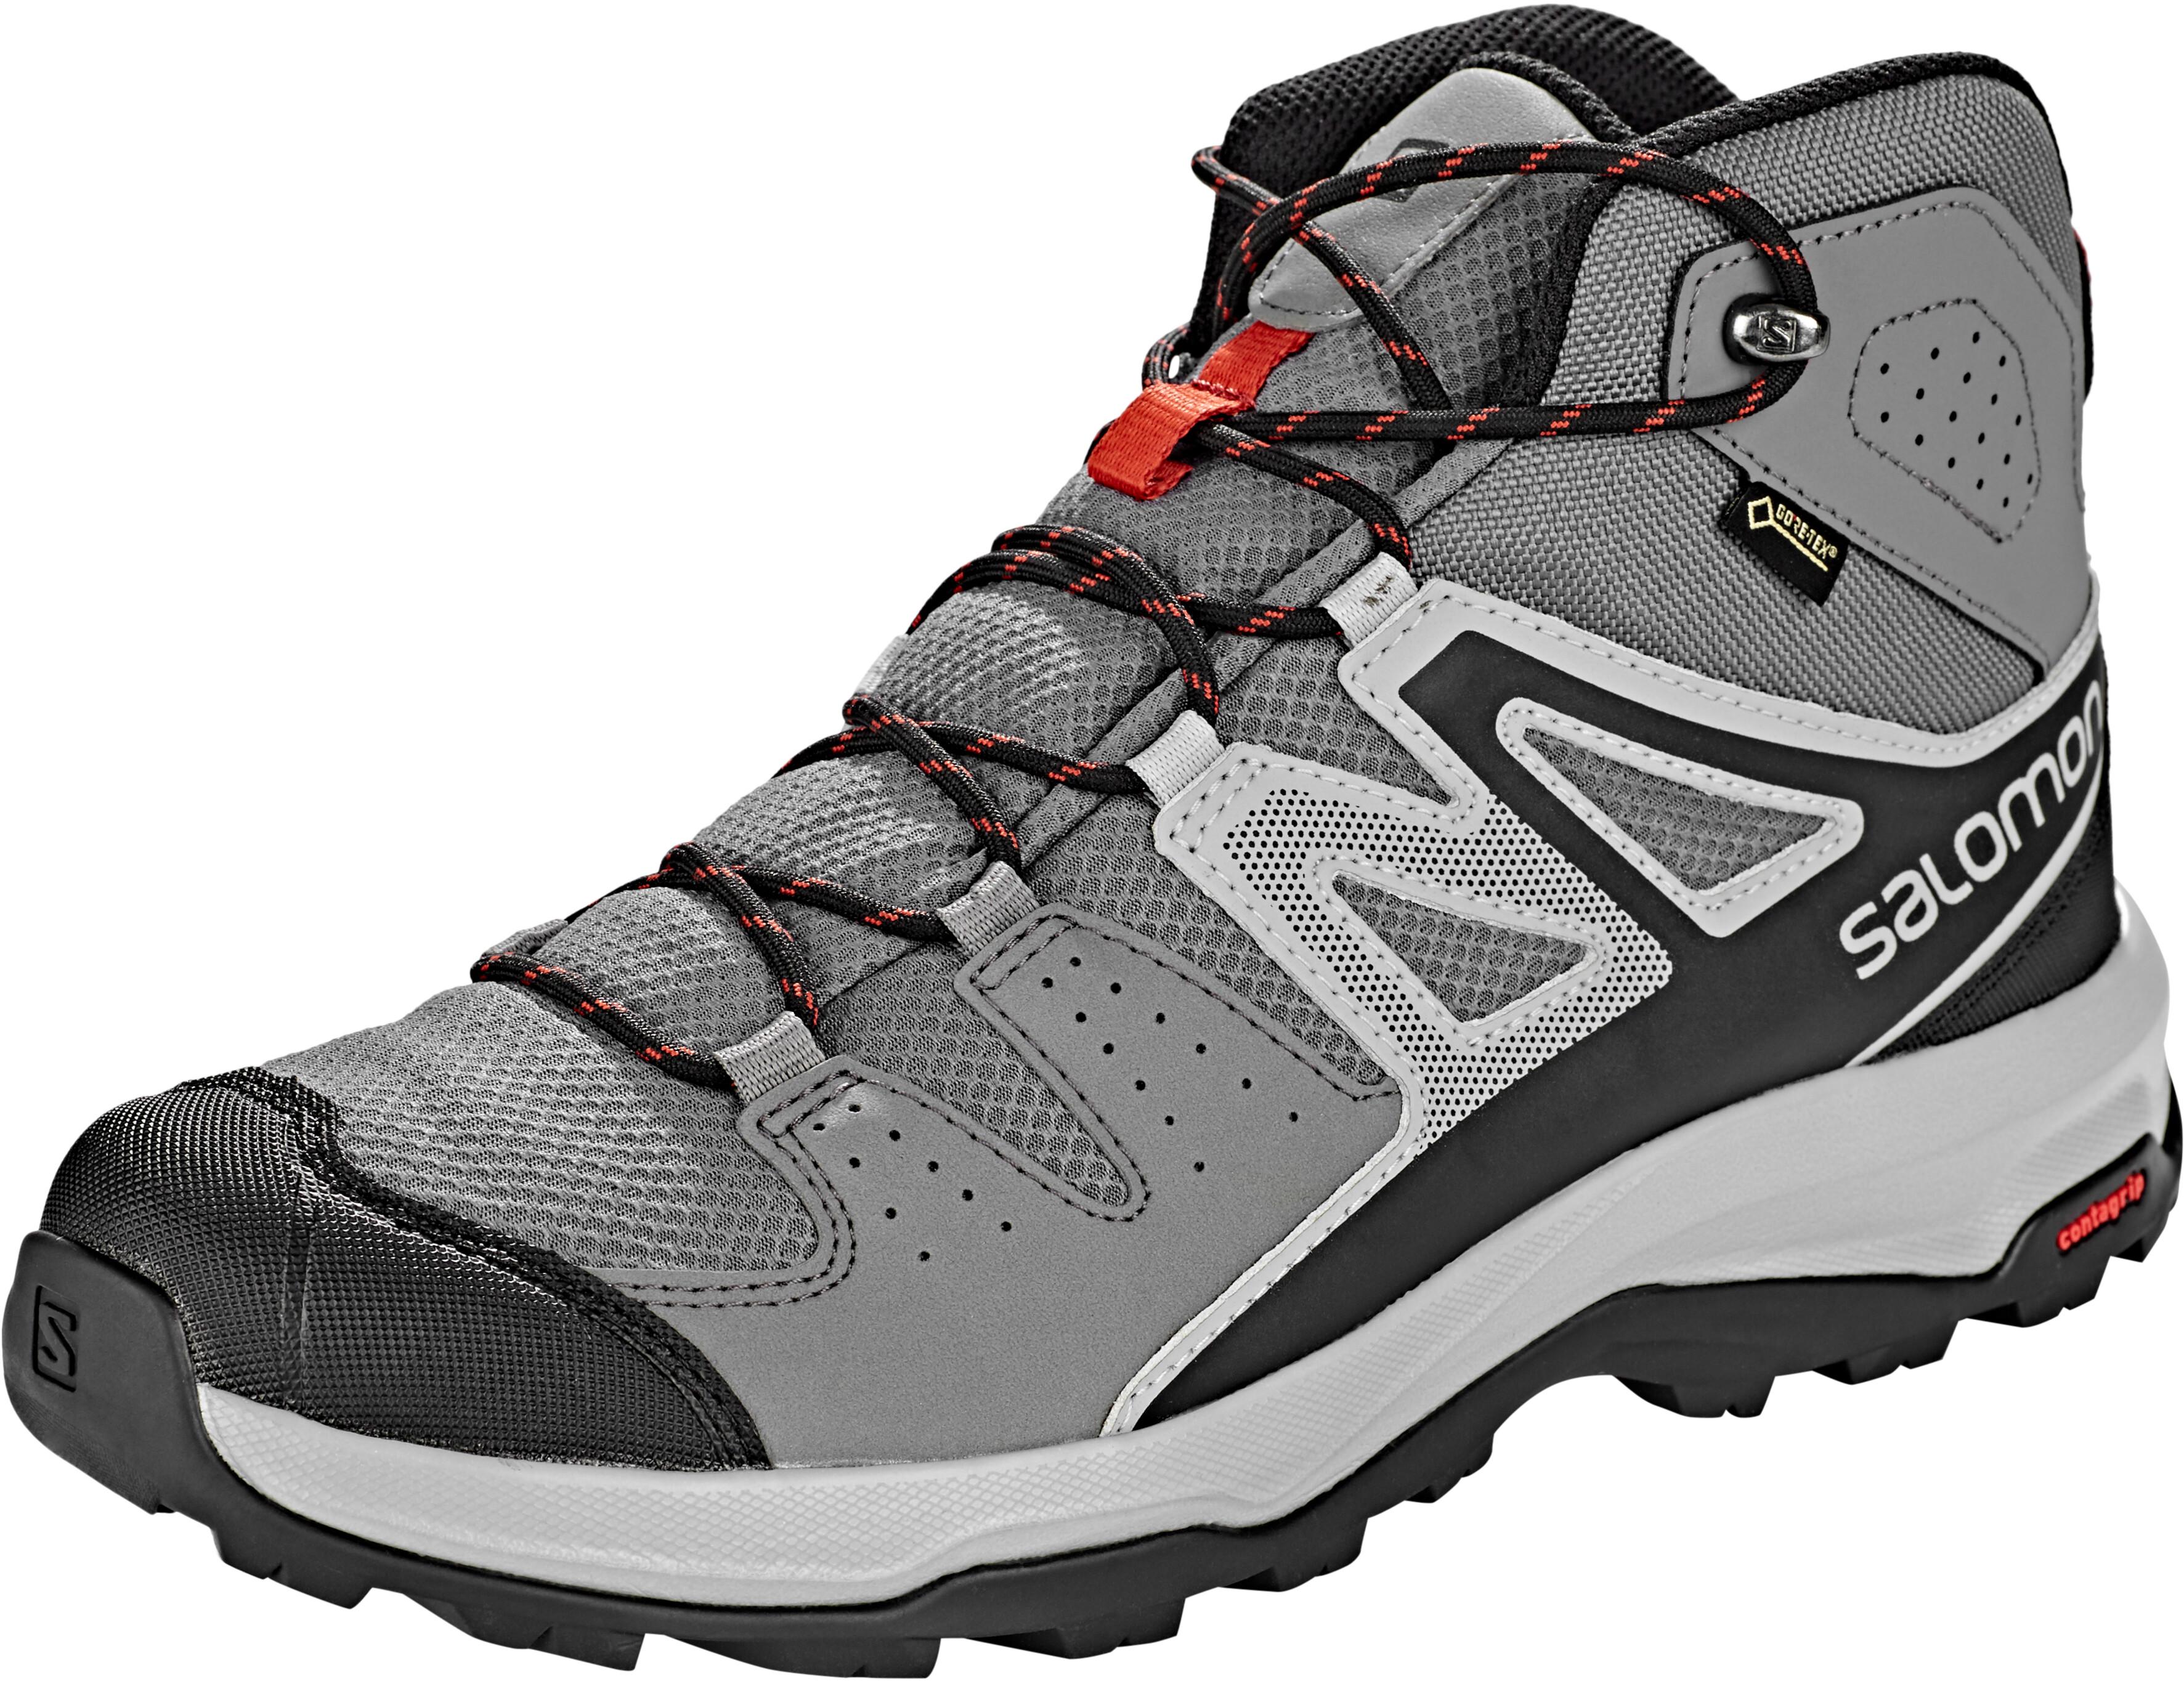 95420760 Salomon X Radiant Mid GTX Shoes Men quiet shade/quarry/bossa nova